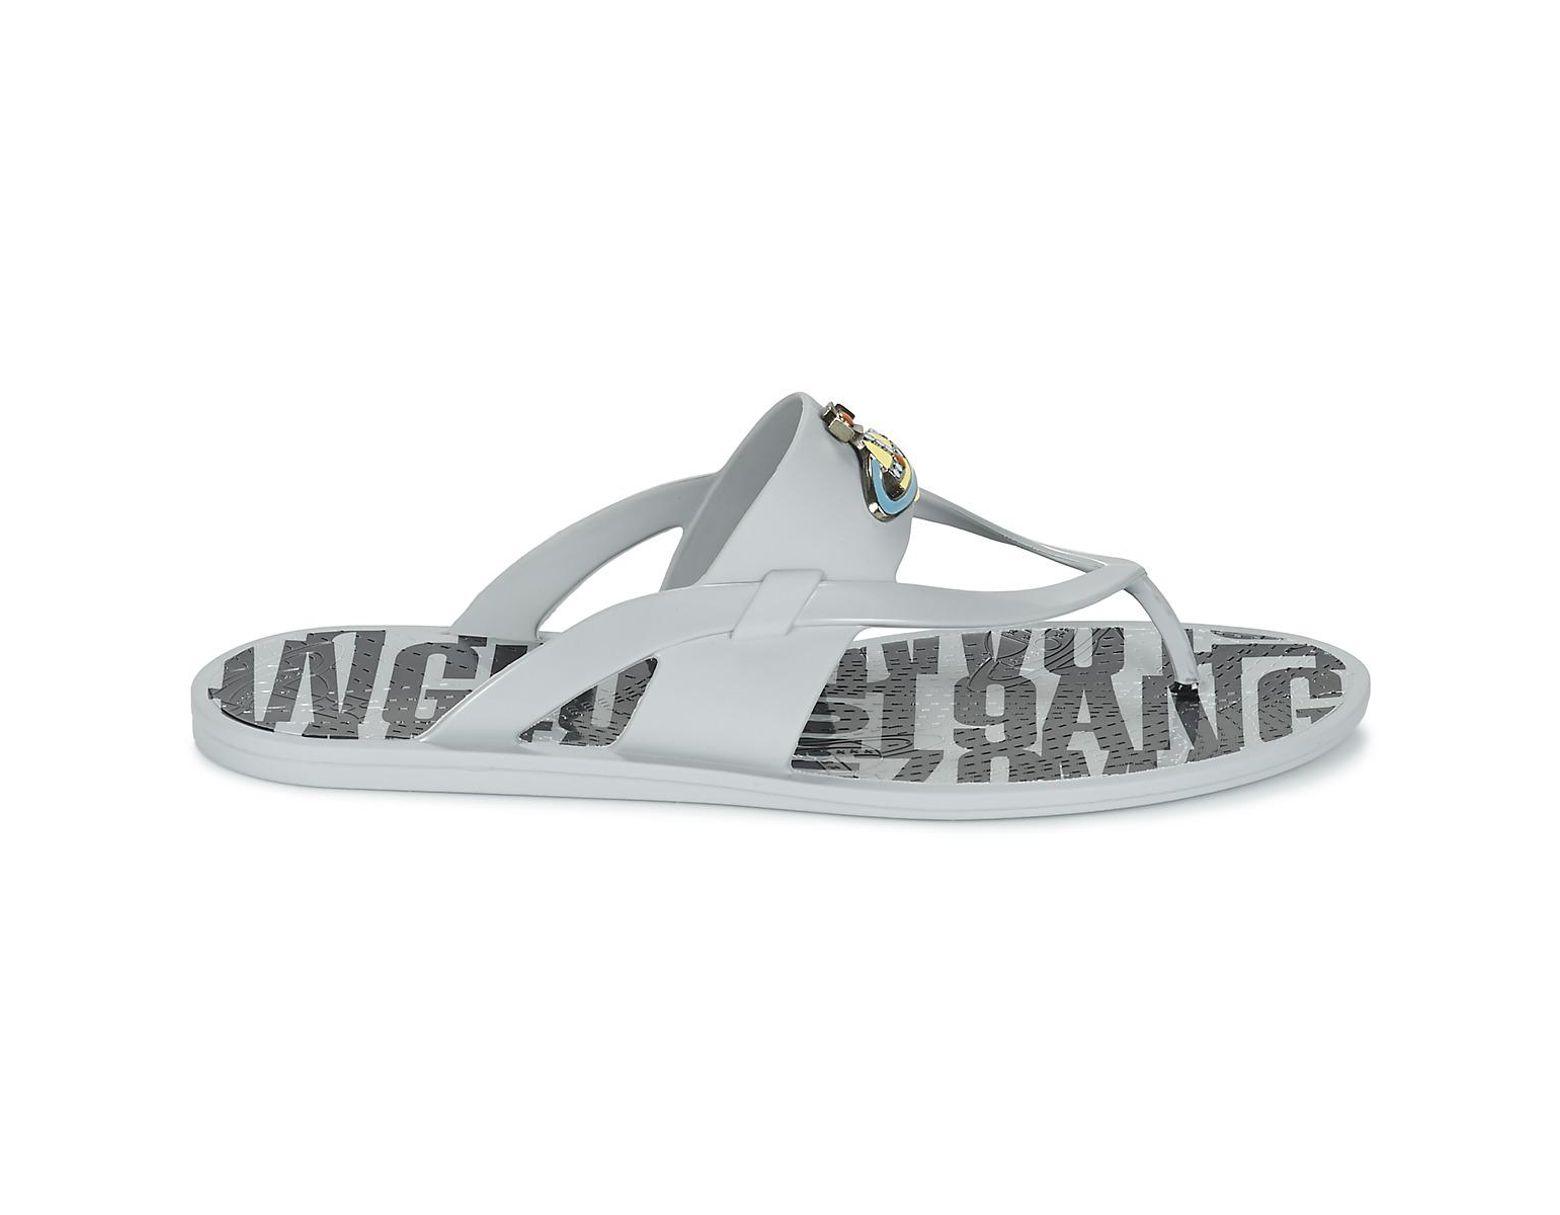 c4c2f8d4a53 Vivienne Westwood Orb Enamelled Sdl Men's Flip Flops / Sandals (shoes) In  Grey in Gray for Men - Lyst